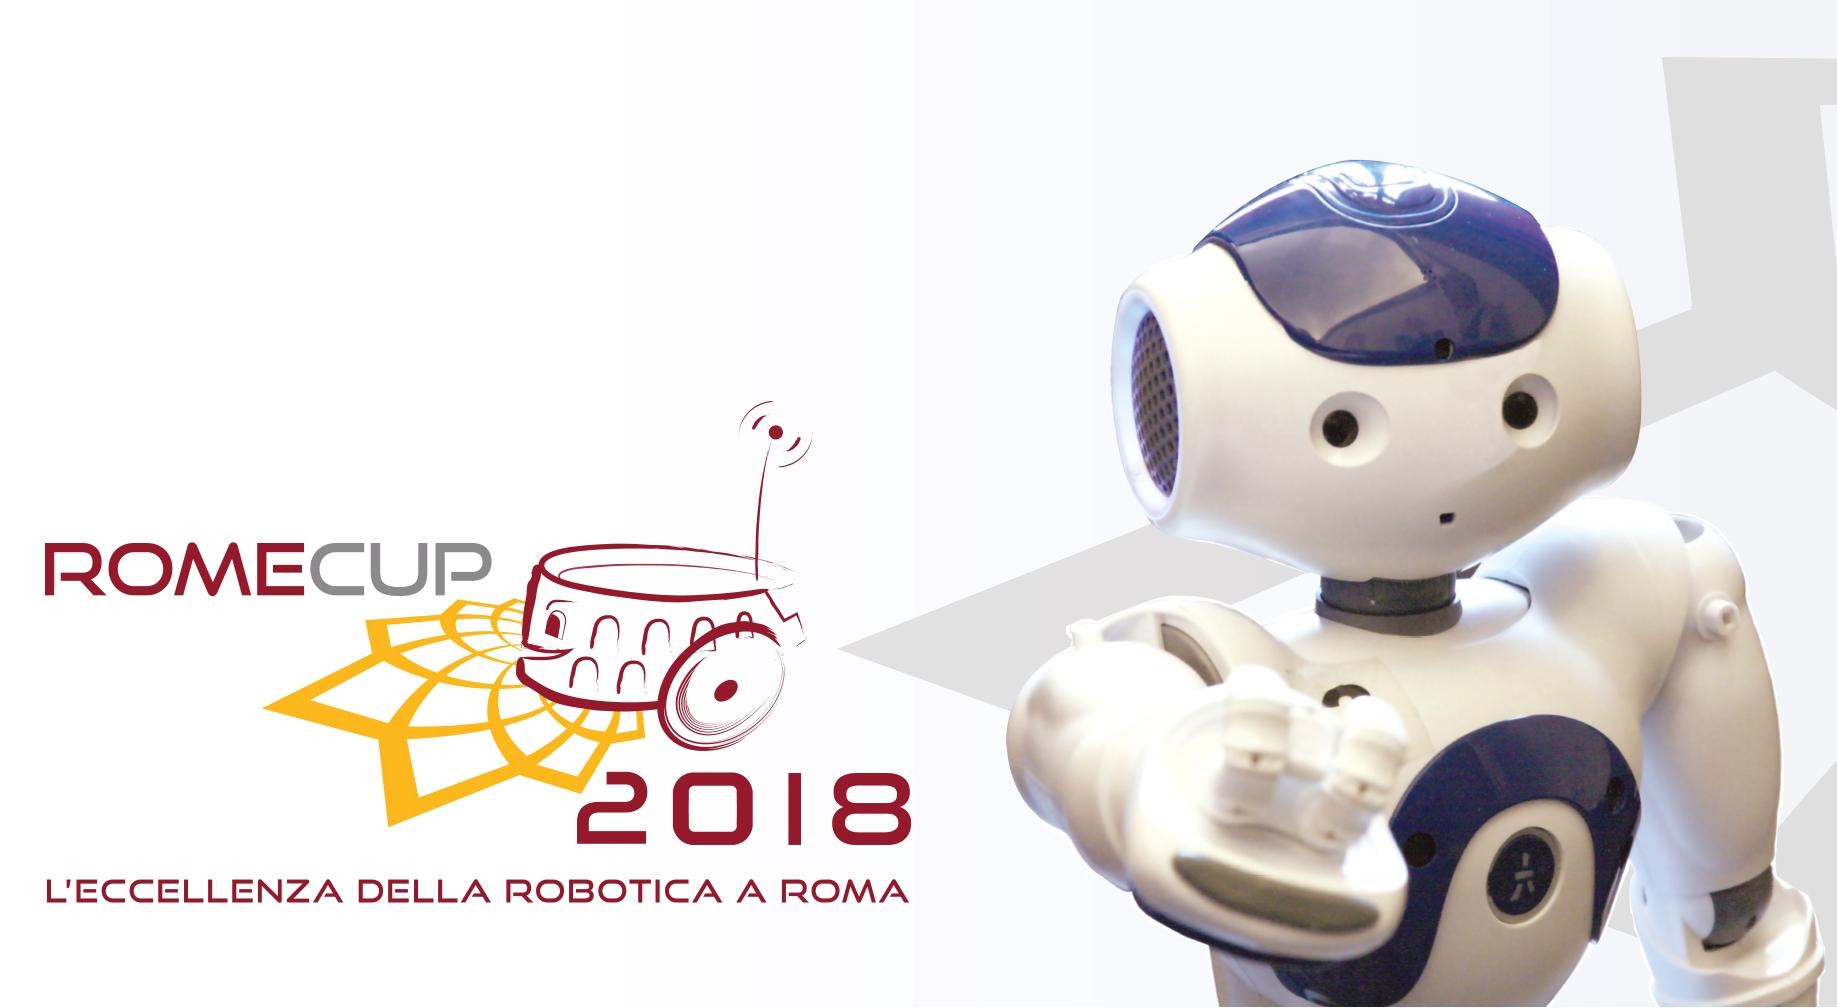 Risultati immagini per romecup2018